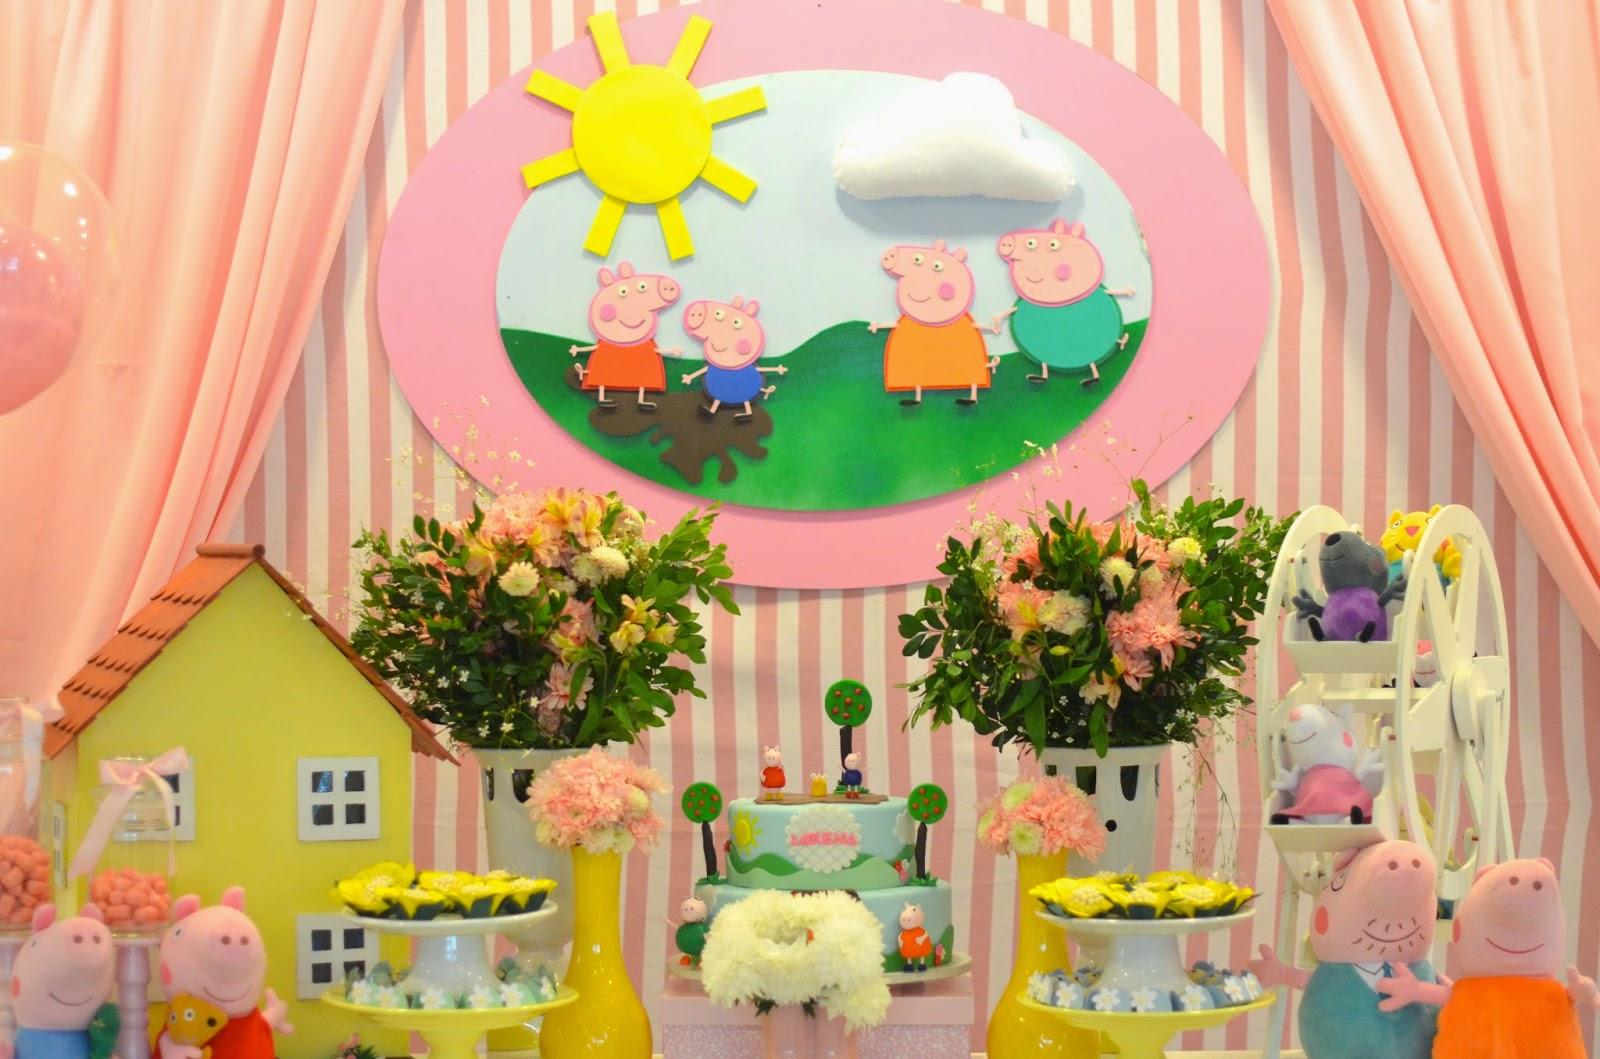 Atelier Personnalis Parque de Diverses da Peppa Pig